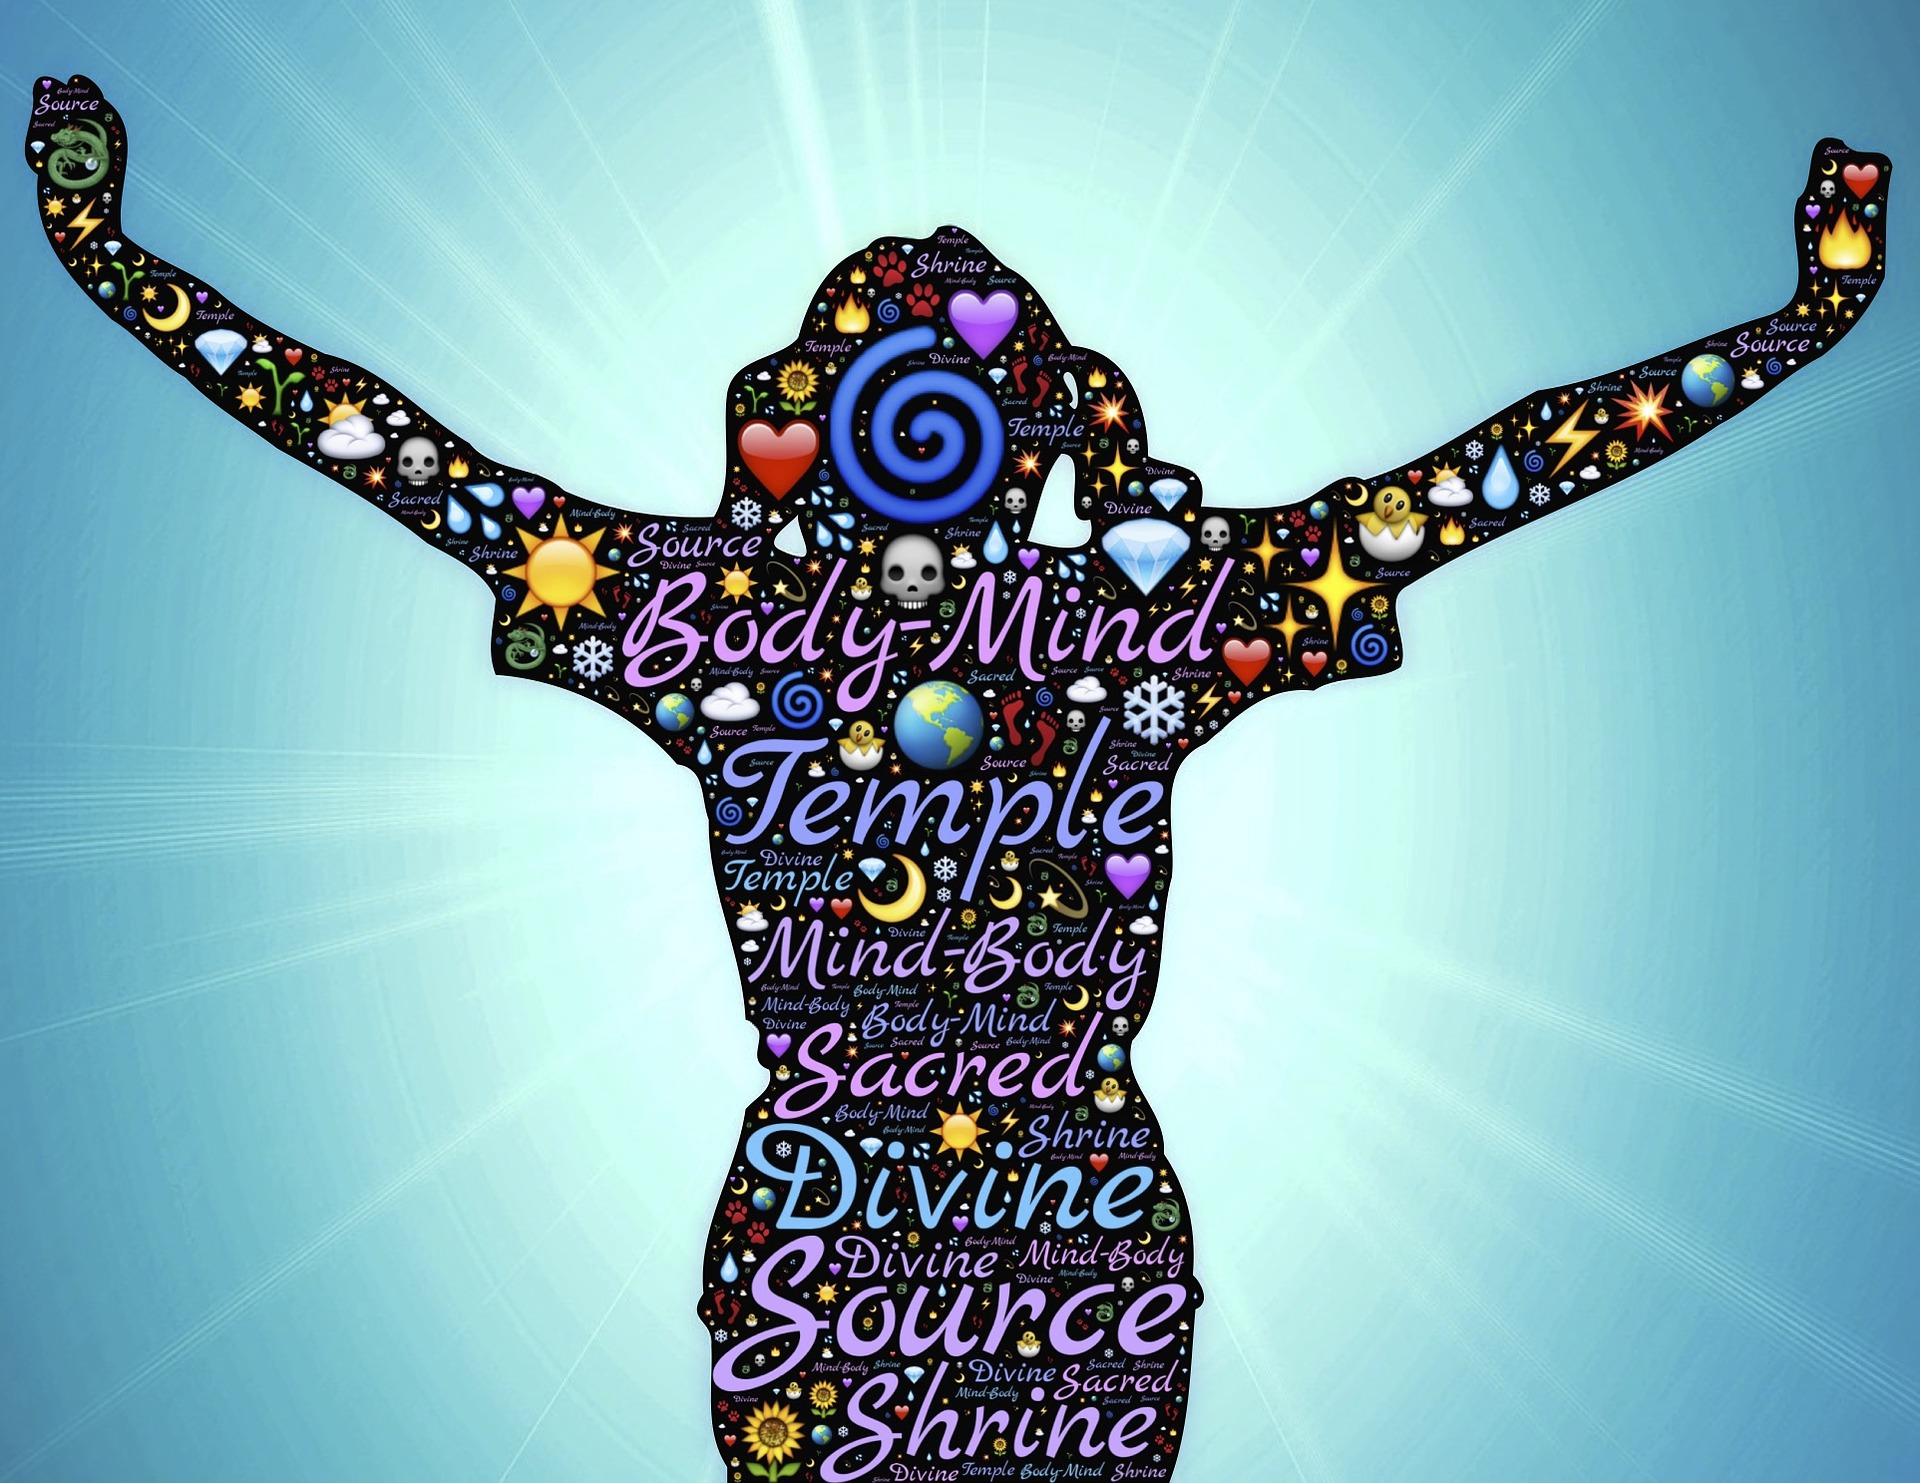 holistic approach to medicine